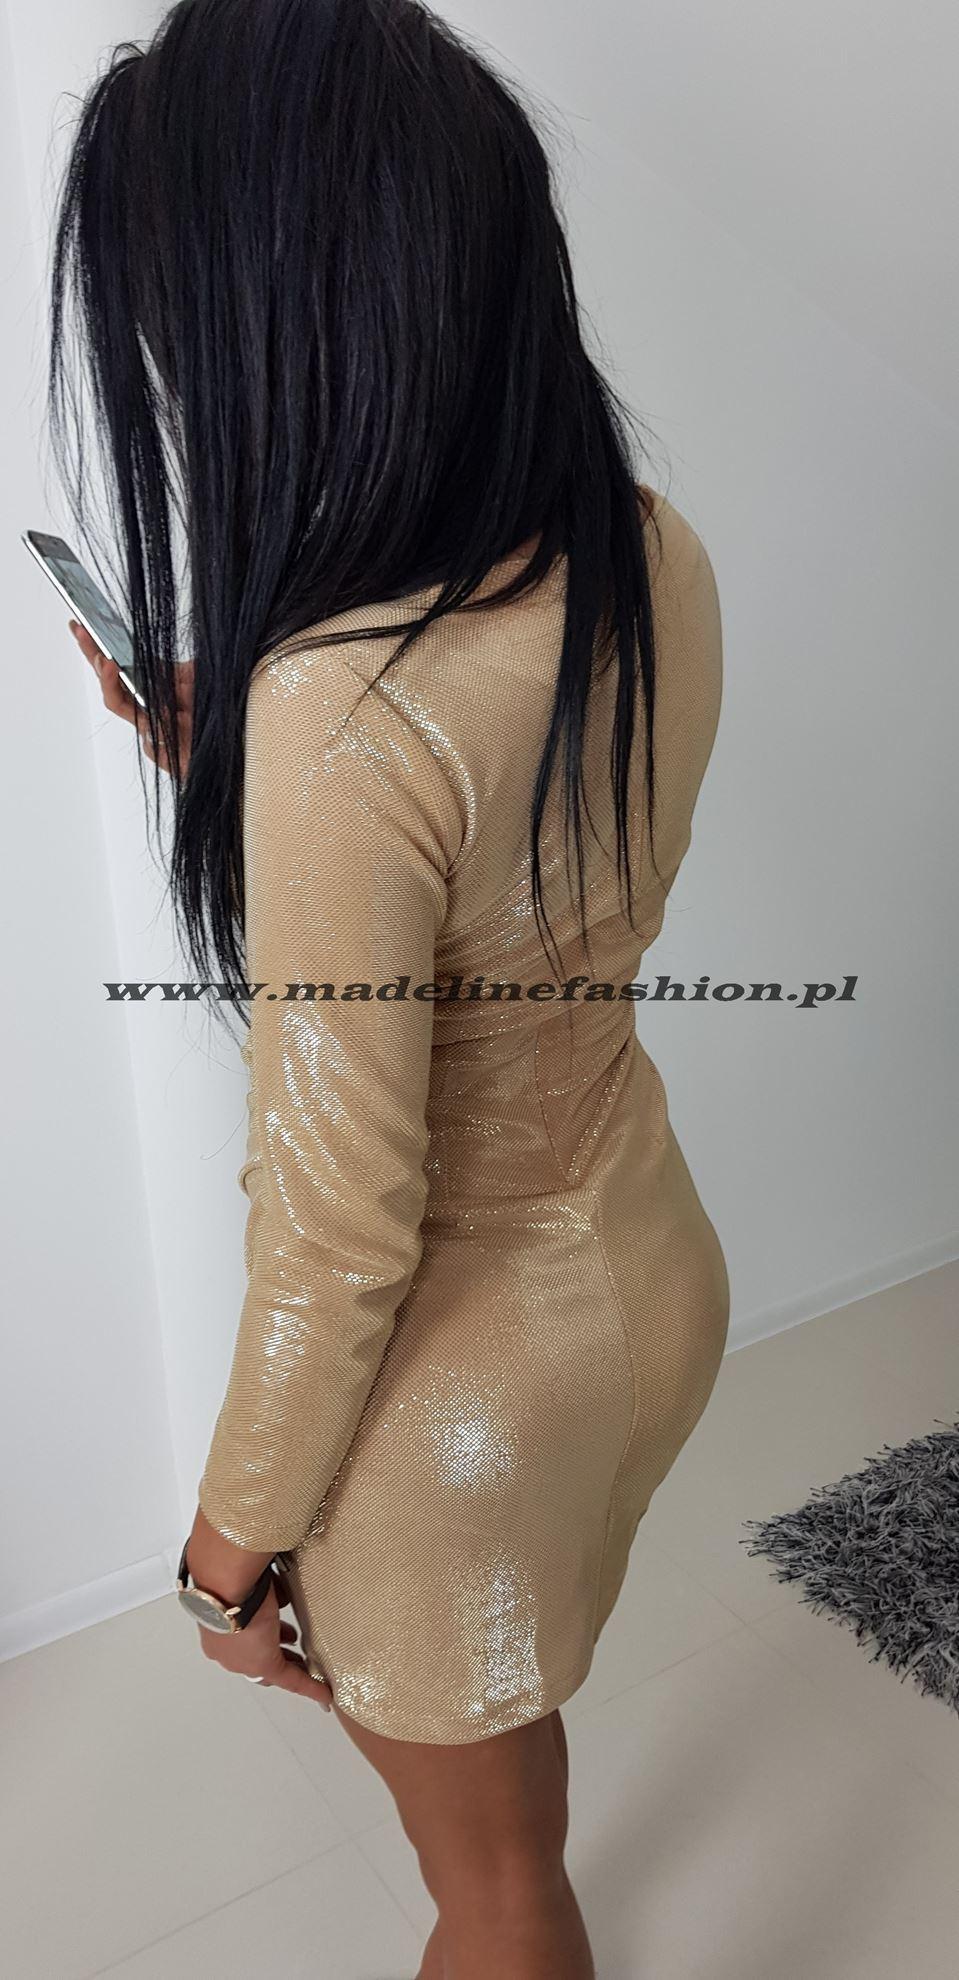 products 0003265 sukienka cekinowa zlota davis 1